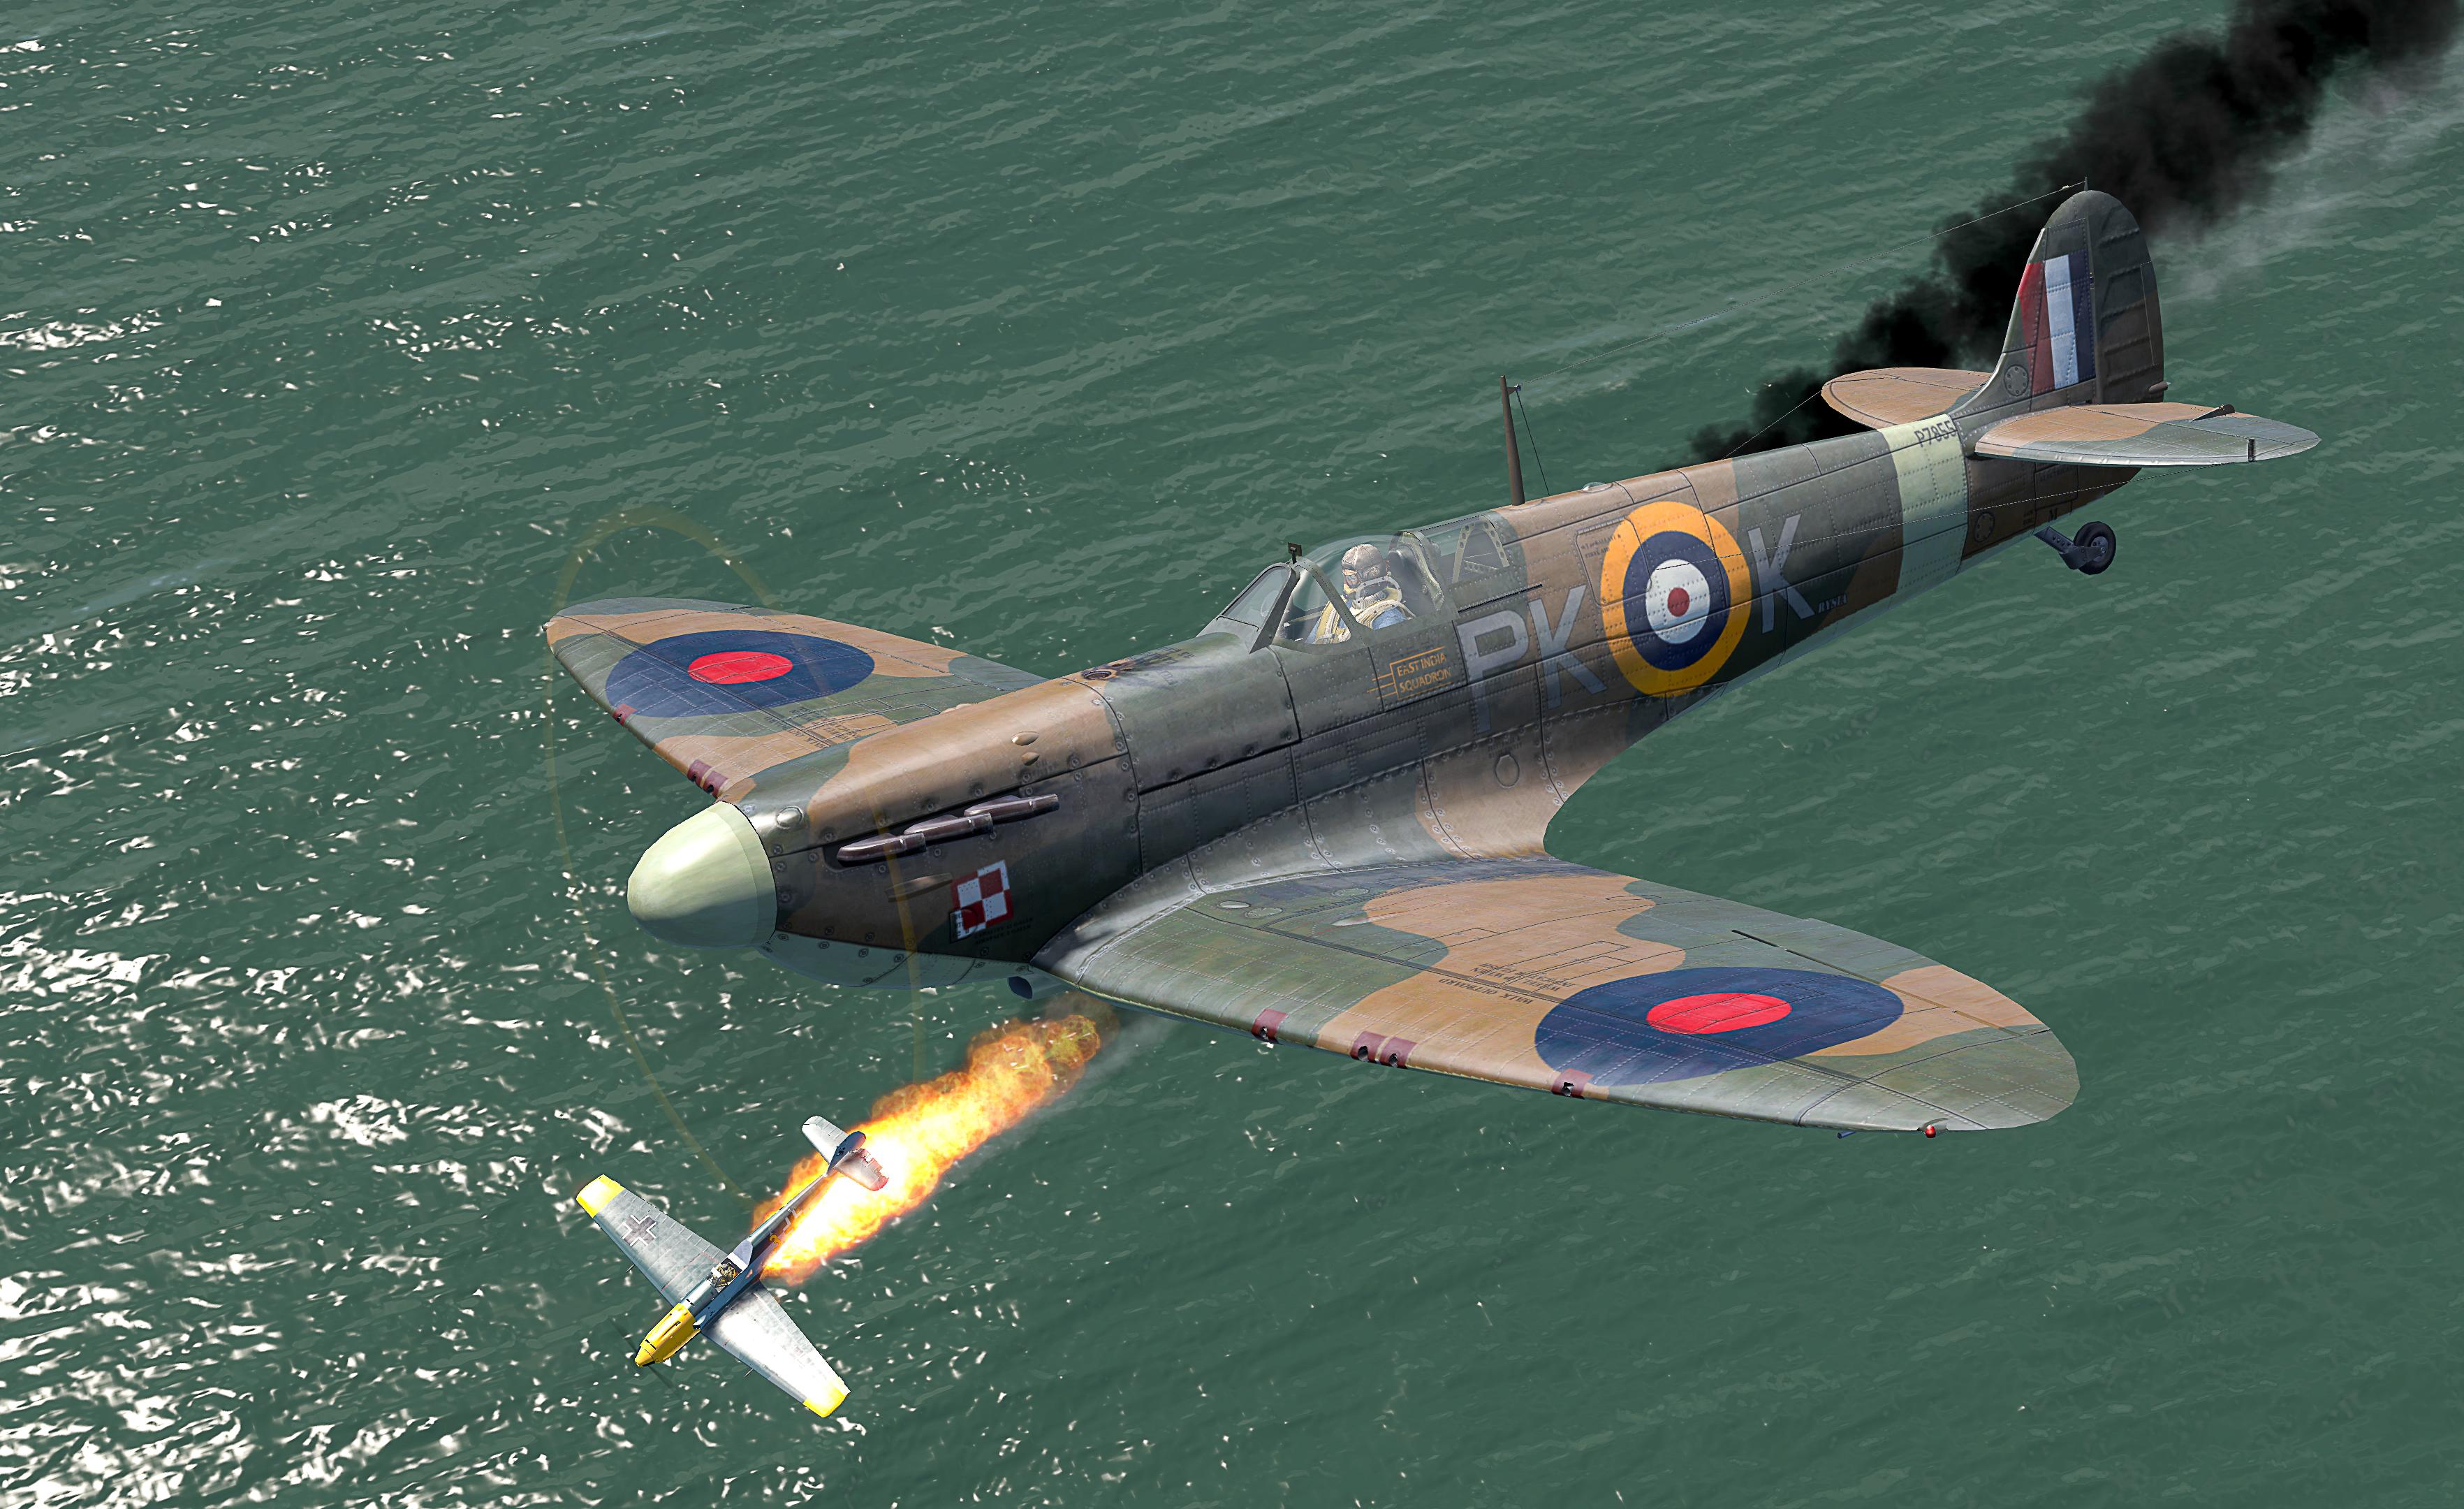 COD KF MkII RAF 315Sqn PKH P8387 Northolt England July 1941 V01